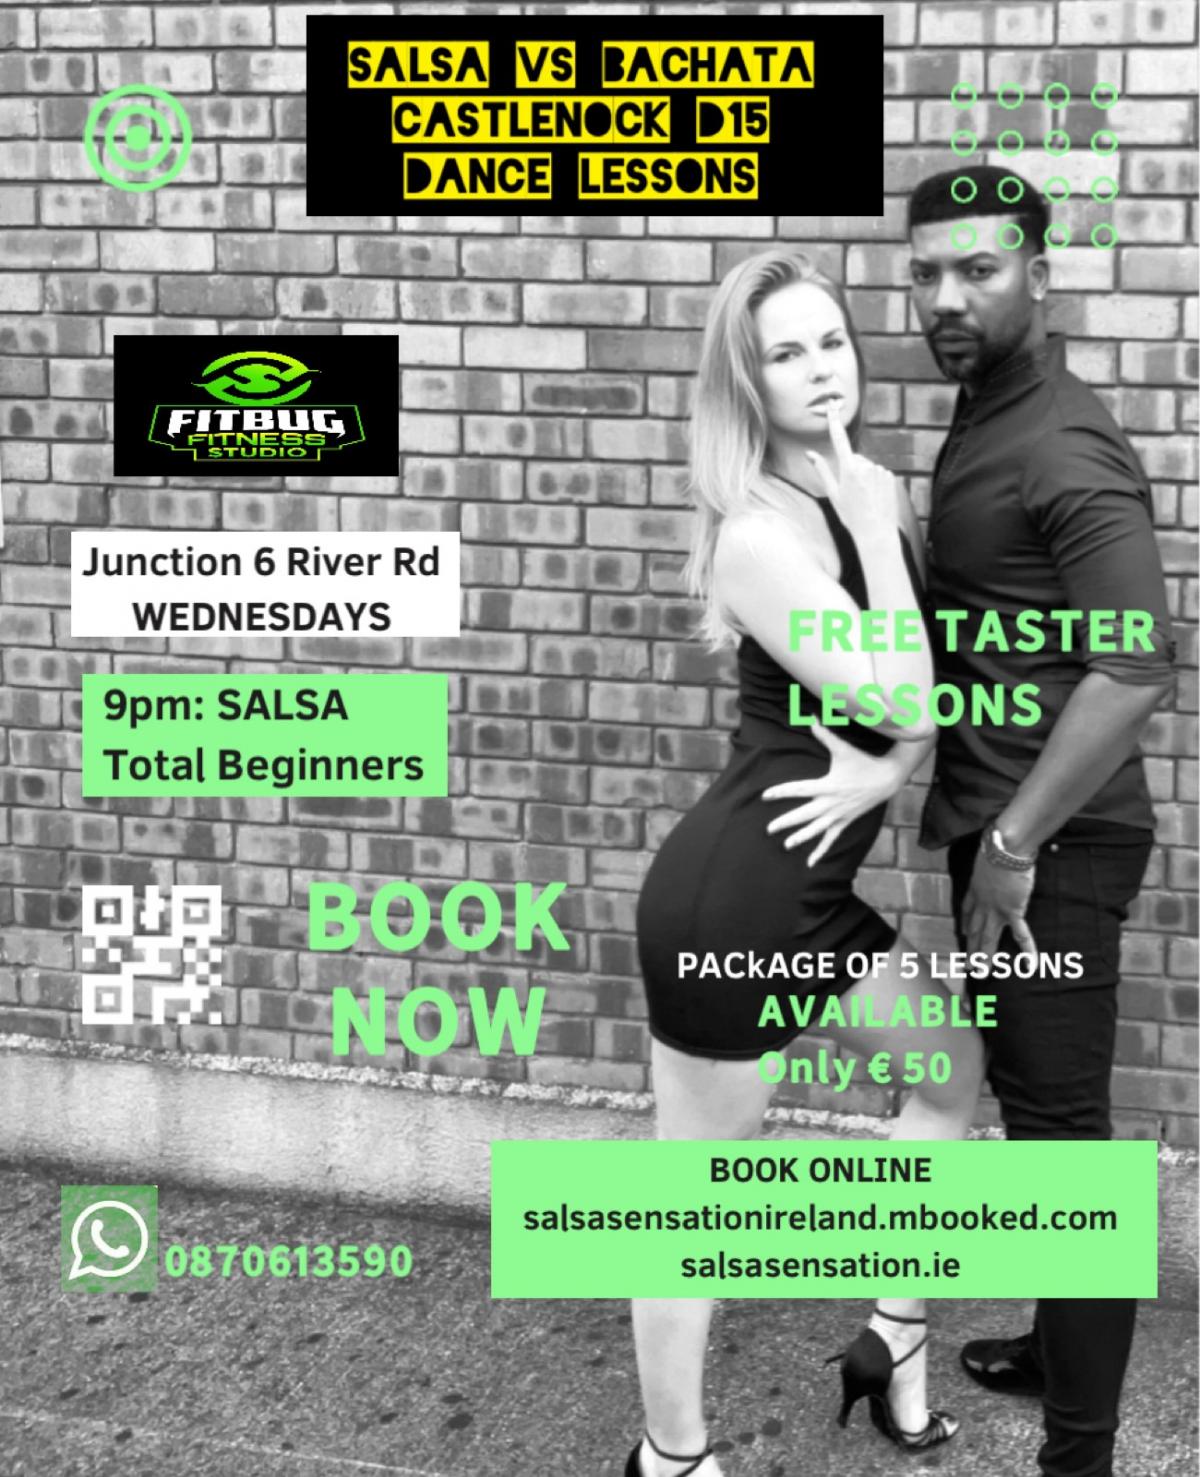 mBooked.com, Wednesdays | Salsa Total Beginners | 5 weeks Course | Castleknock D15, Castleknock, Dublin 15, Salsa Sensation Ireland